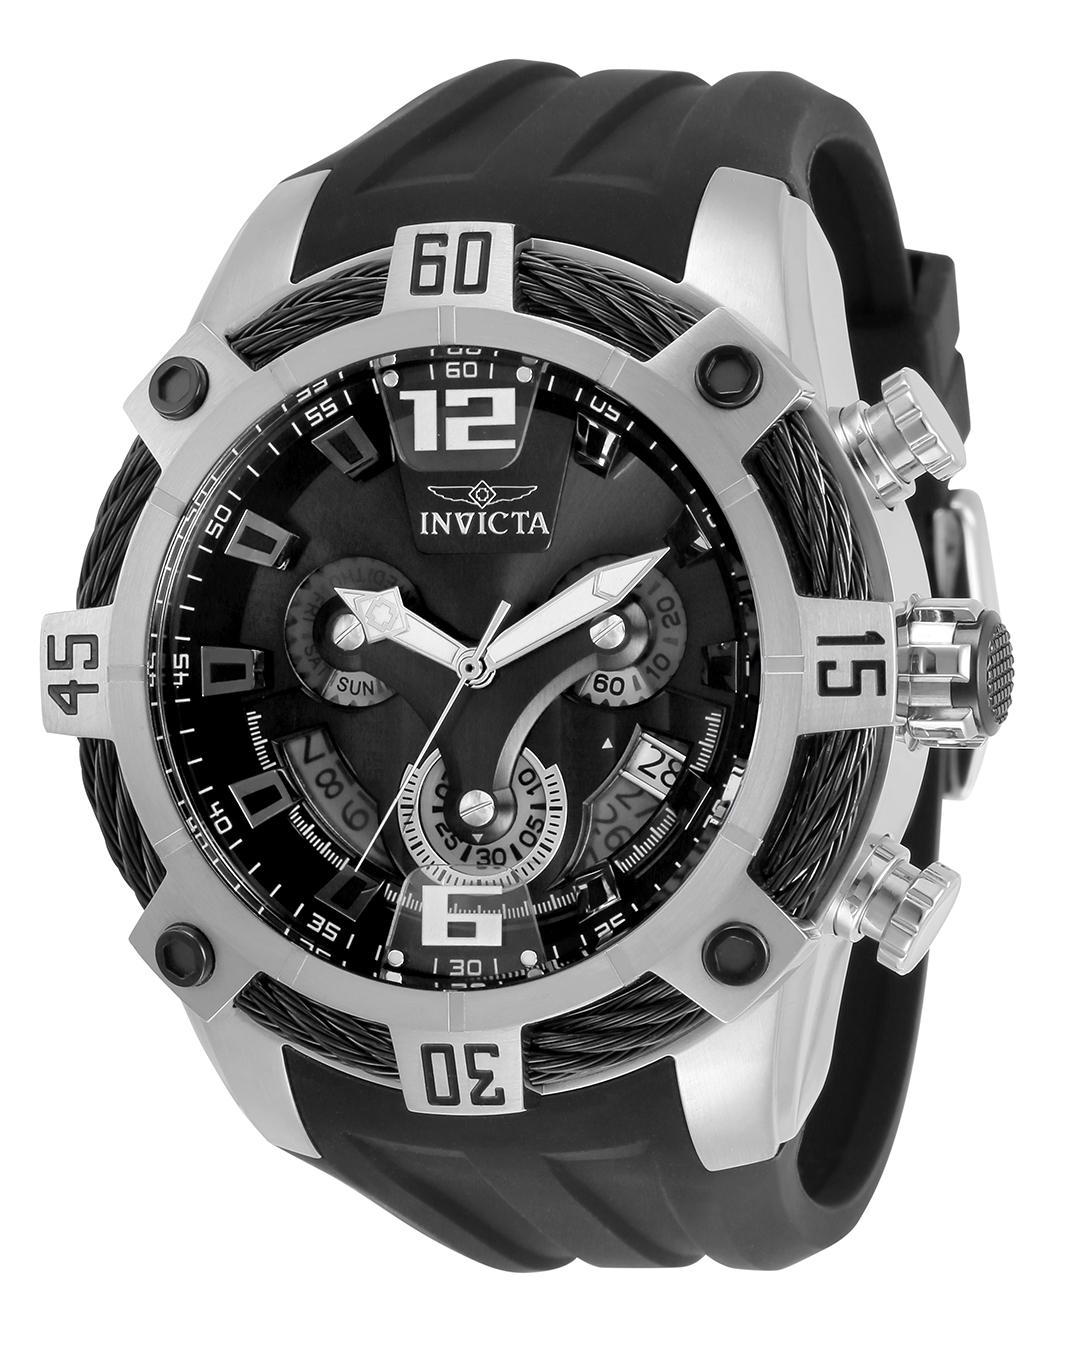 Invicta Bolt Quartz Mens Watch - 51mm Stainless Steel Case, Polyurethane Band, Black (33288)